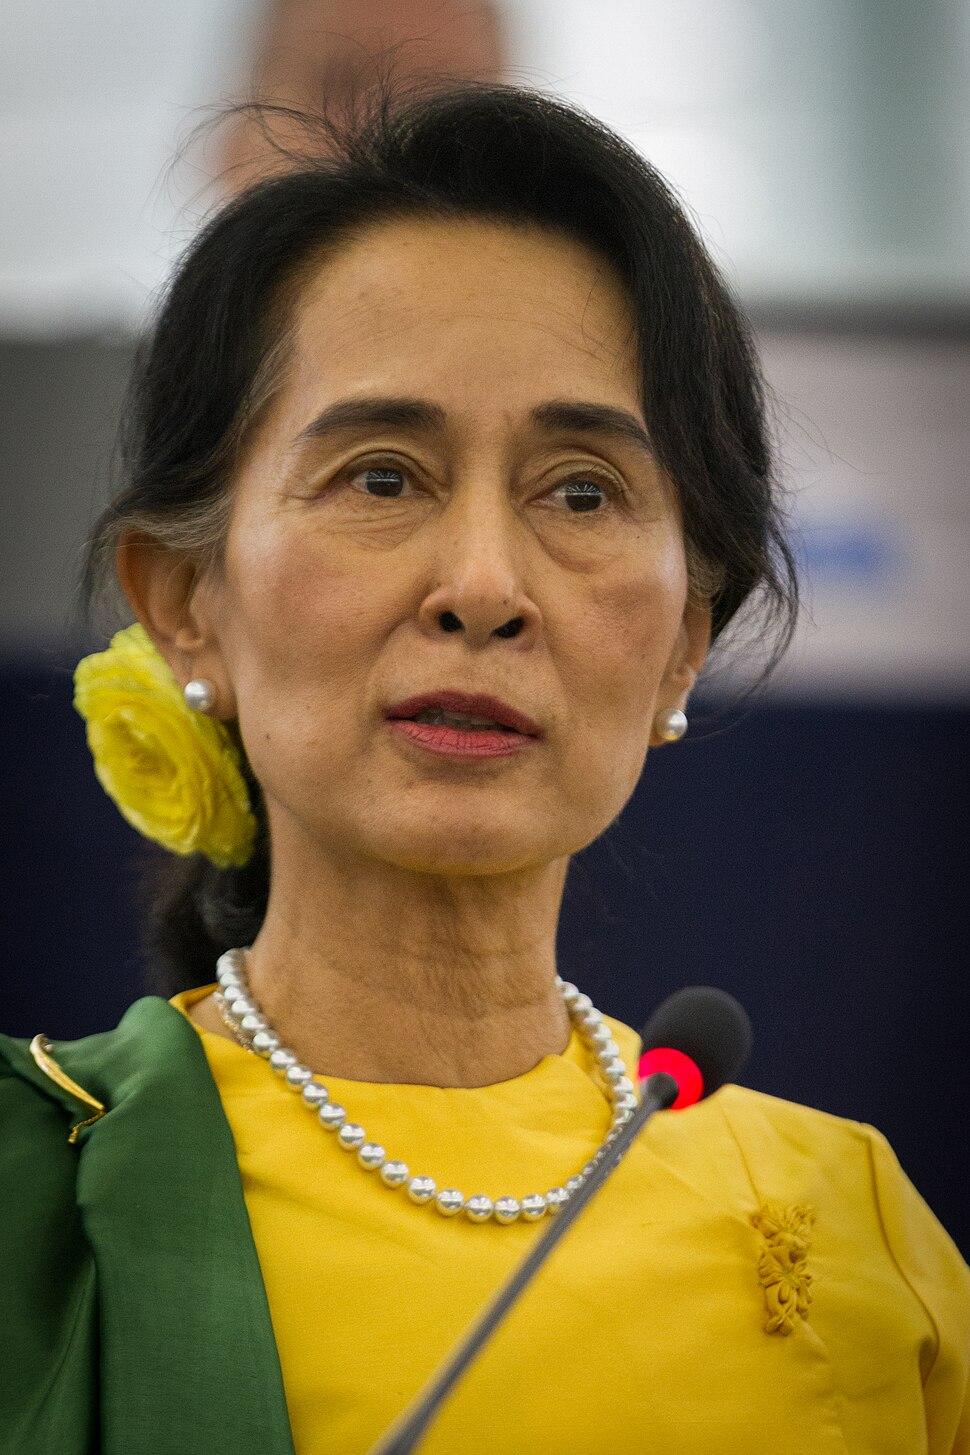 Remise du Prix Sakharov %C3%A0 Aung San Suu Kyi Strasbourg 22 octobre 2013-18